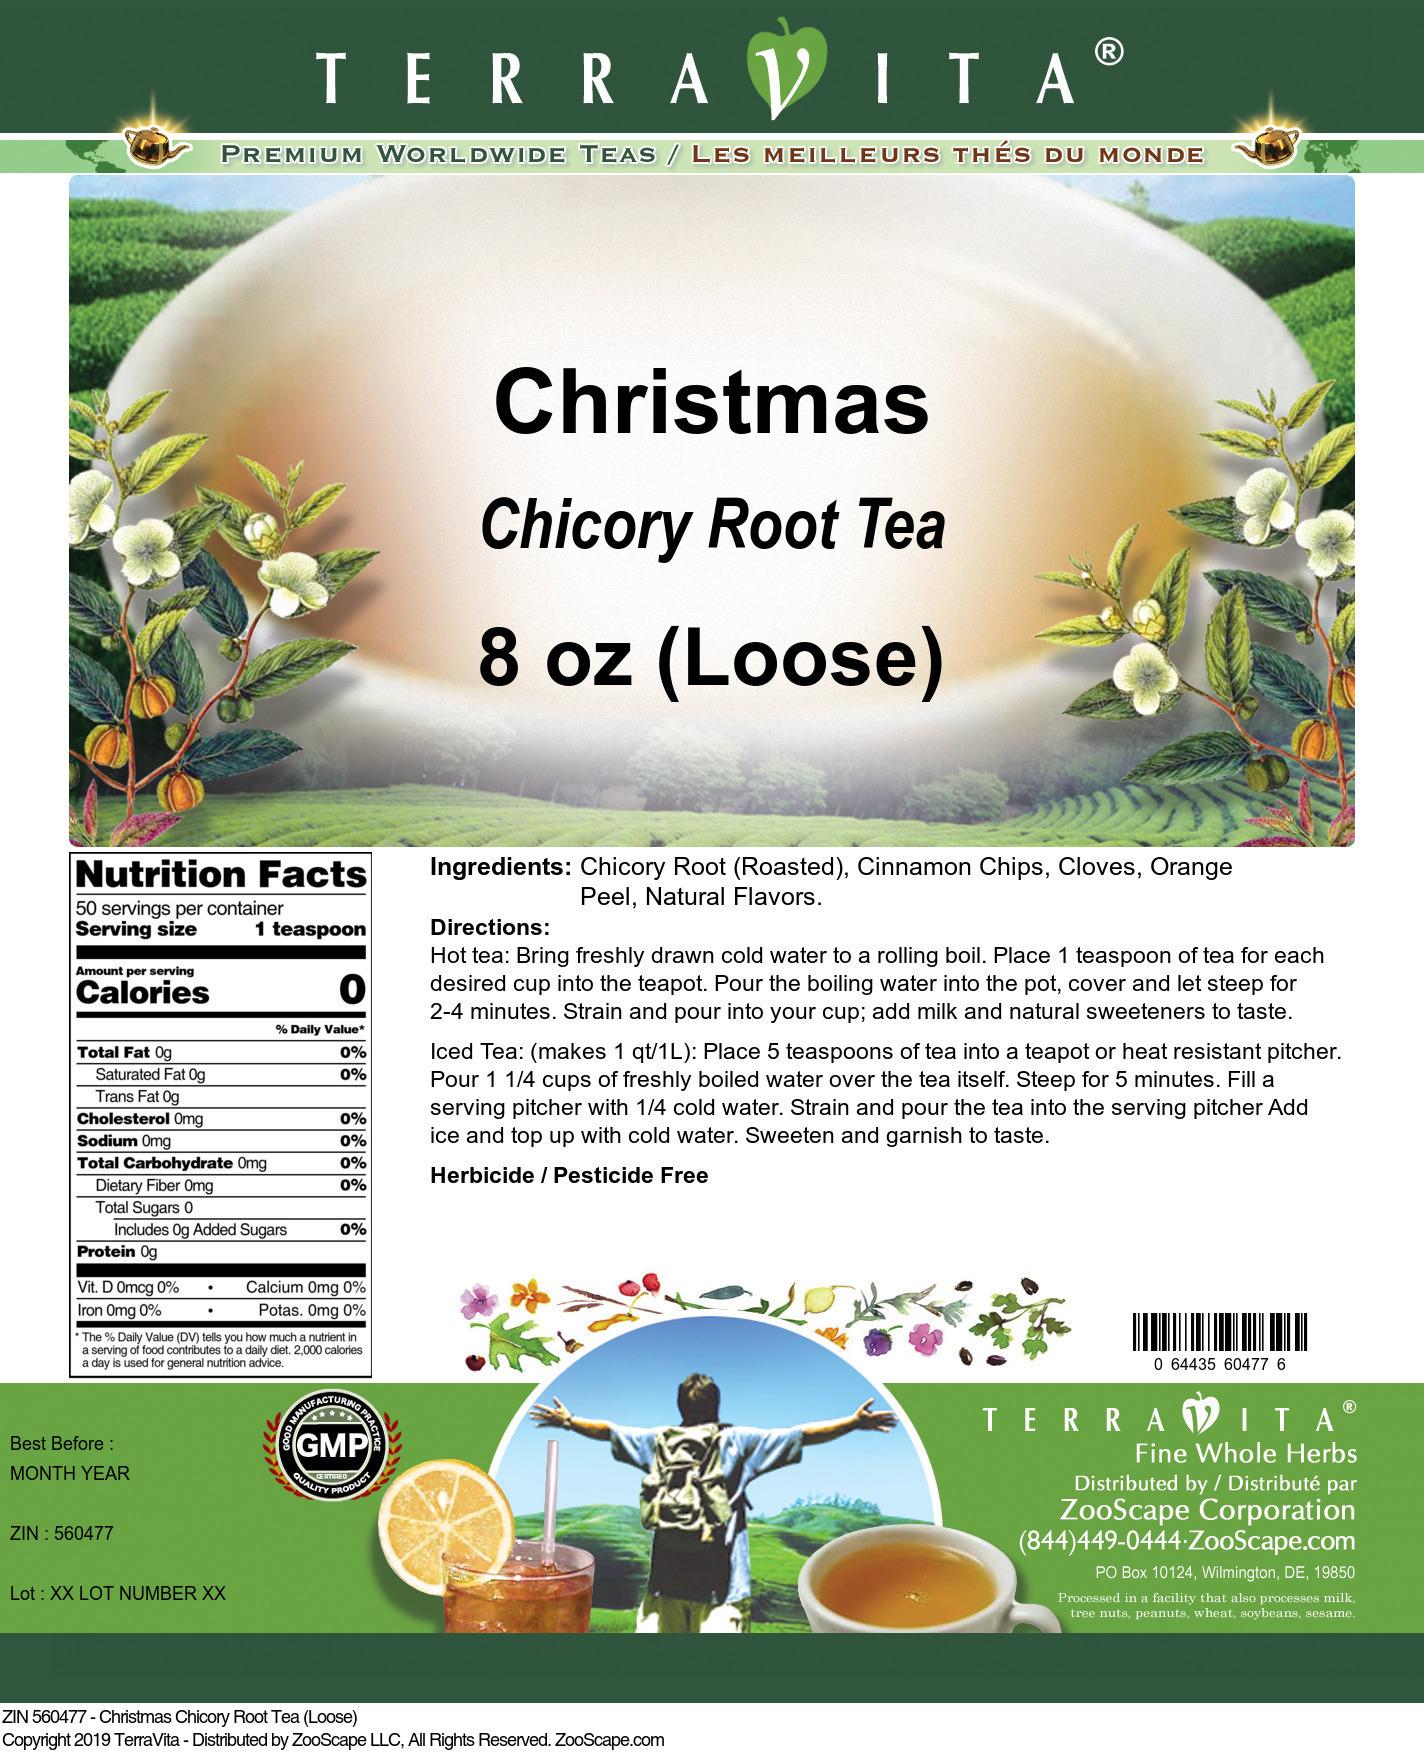 Christmas Chicory Root Tea (Loose)